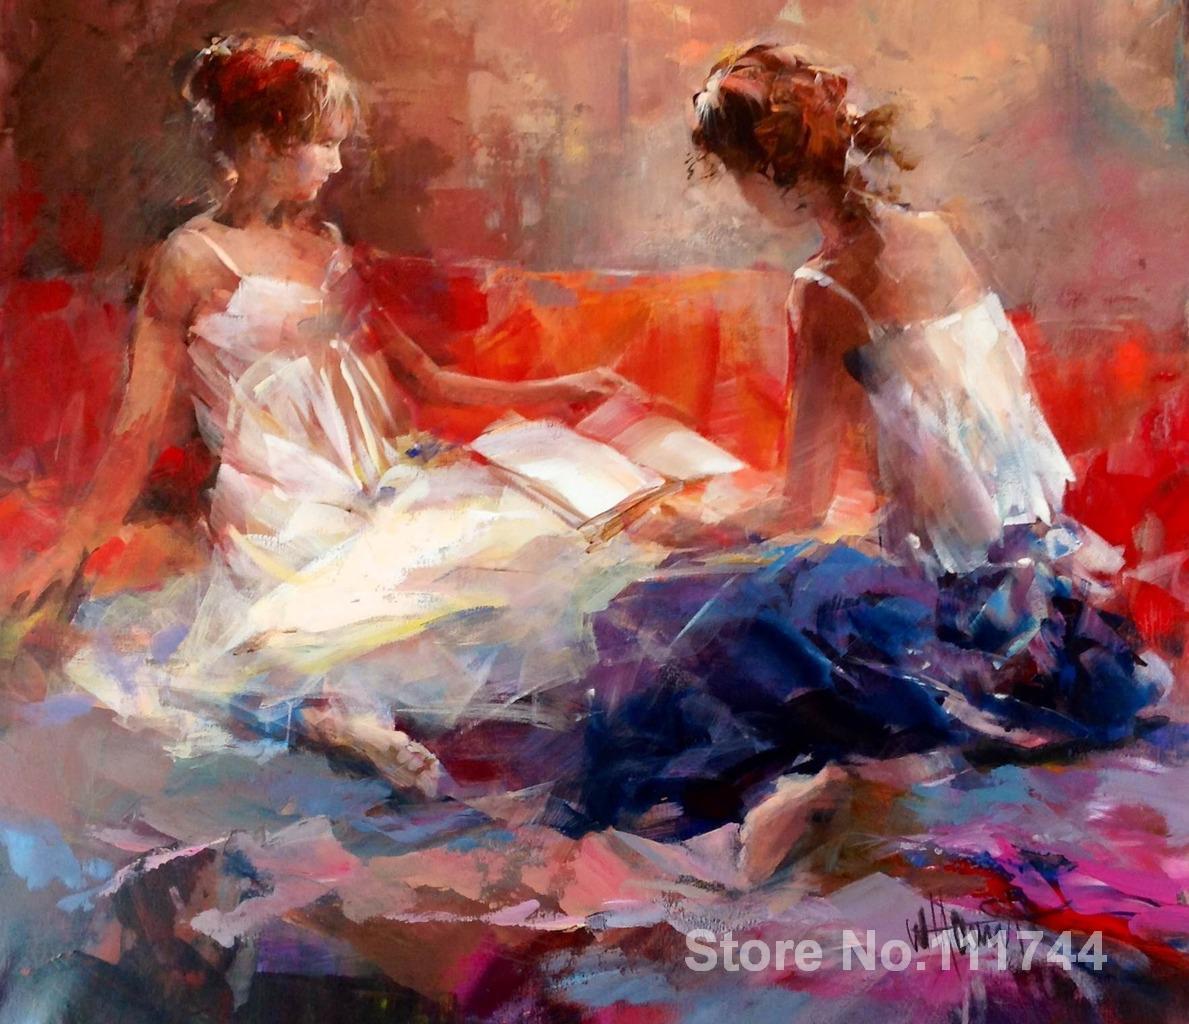 b82f147bd الفن الجميل لل نوم فتاتين ويليم haenraets لوحات مرسومة باليد عالية الجودة